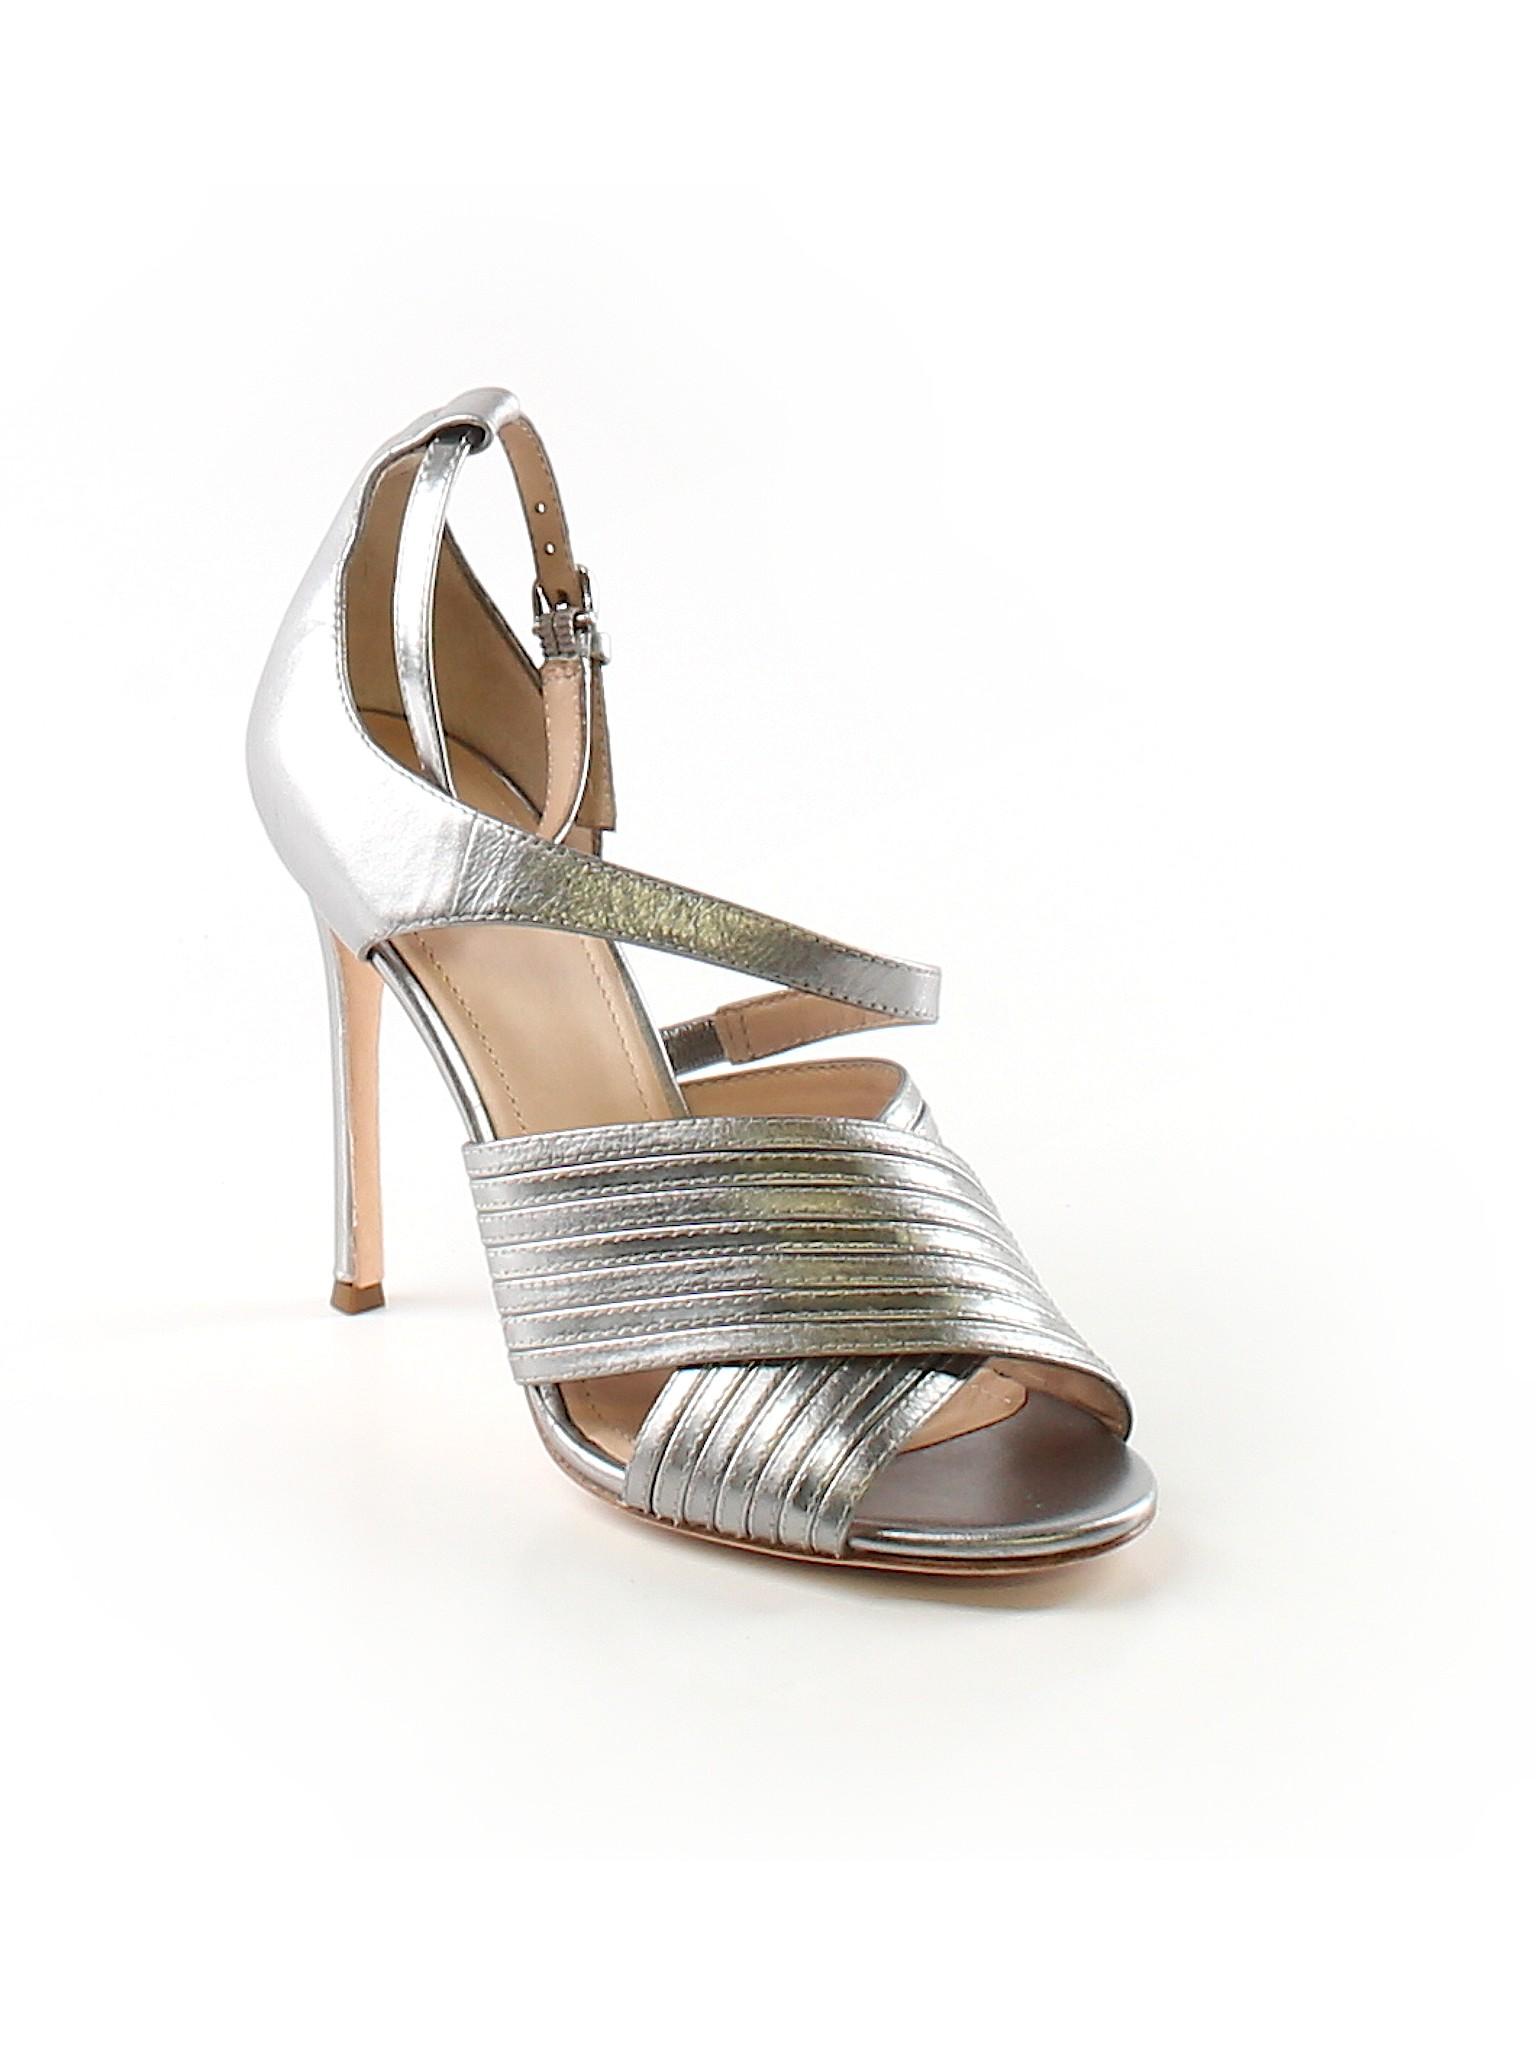 Boutique Studio Boutique PLV Studio PLV promotion Heels promotion 4Oq64Ywr